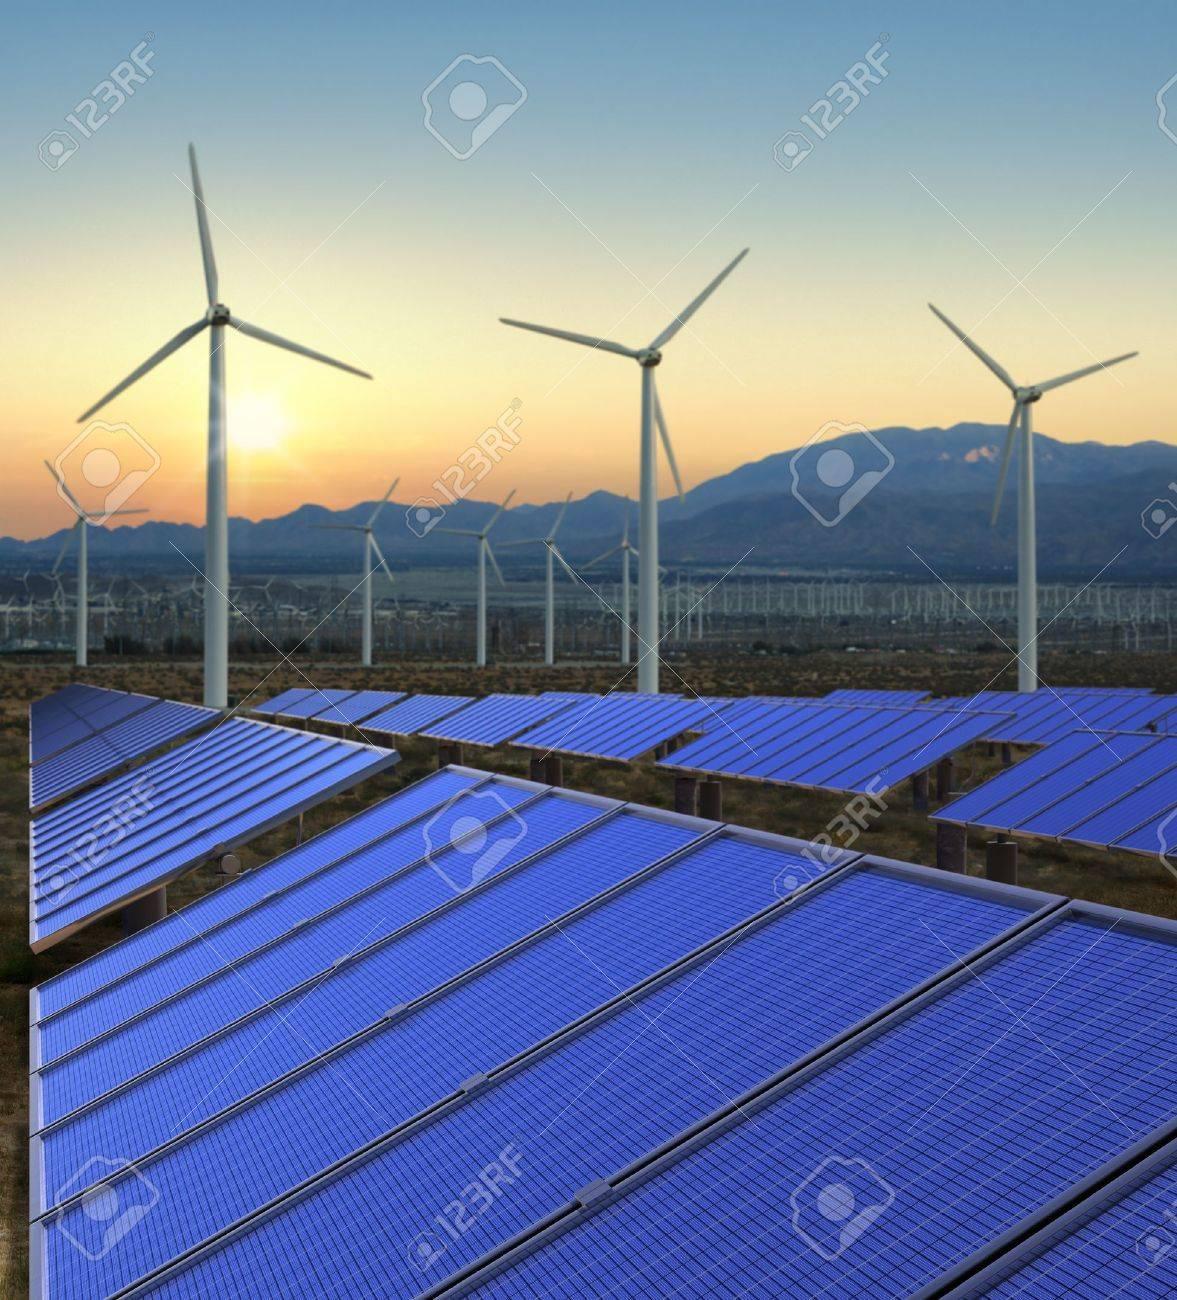 Wind turbines and solar panels on a renewable energy farm. Stock Photo - 15442377